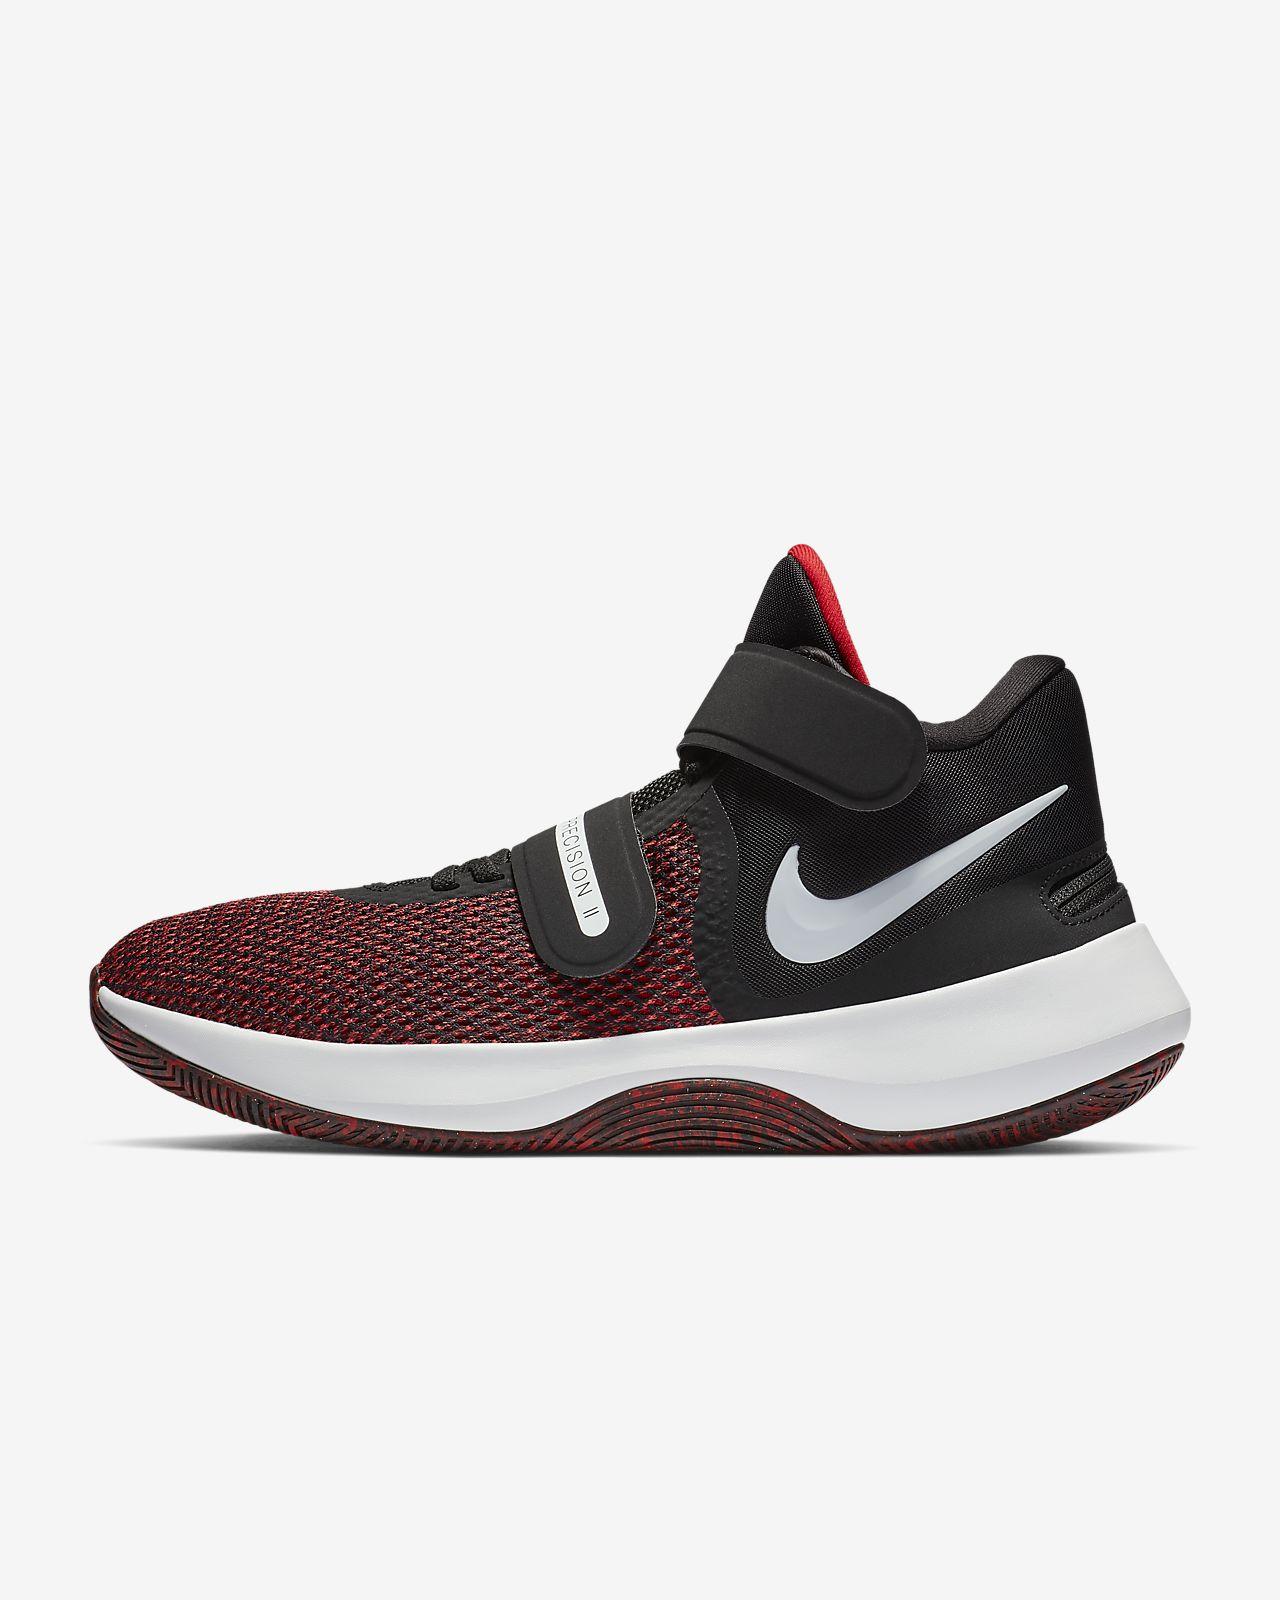 Men's Basketball Shoe. Nike Air Precision II FlyEase